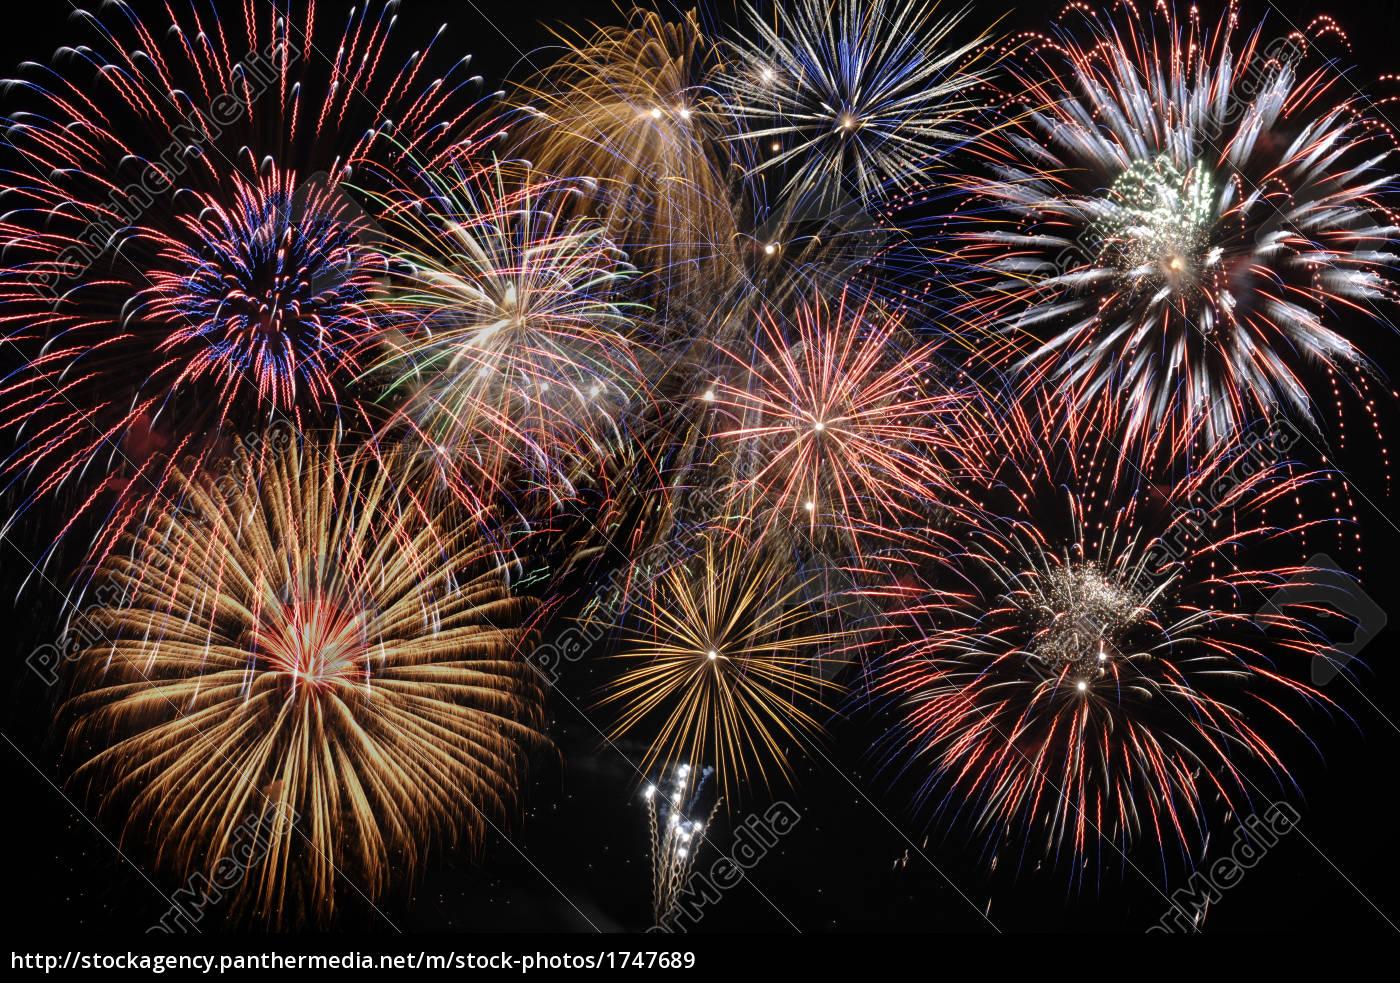 Feuerwerk Silvester - Stockfoto - #1747689 - Bildagentur ...